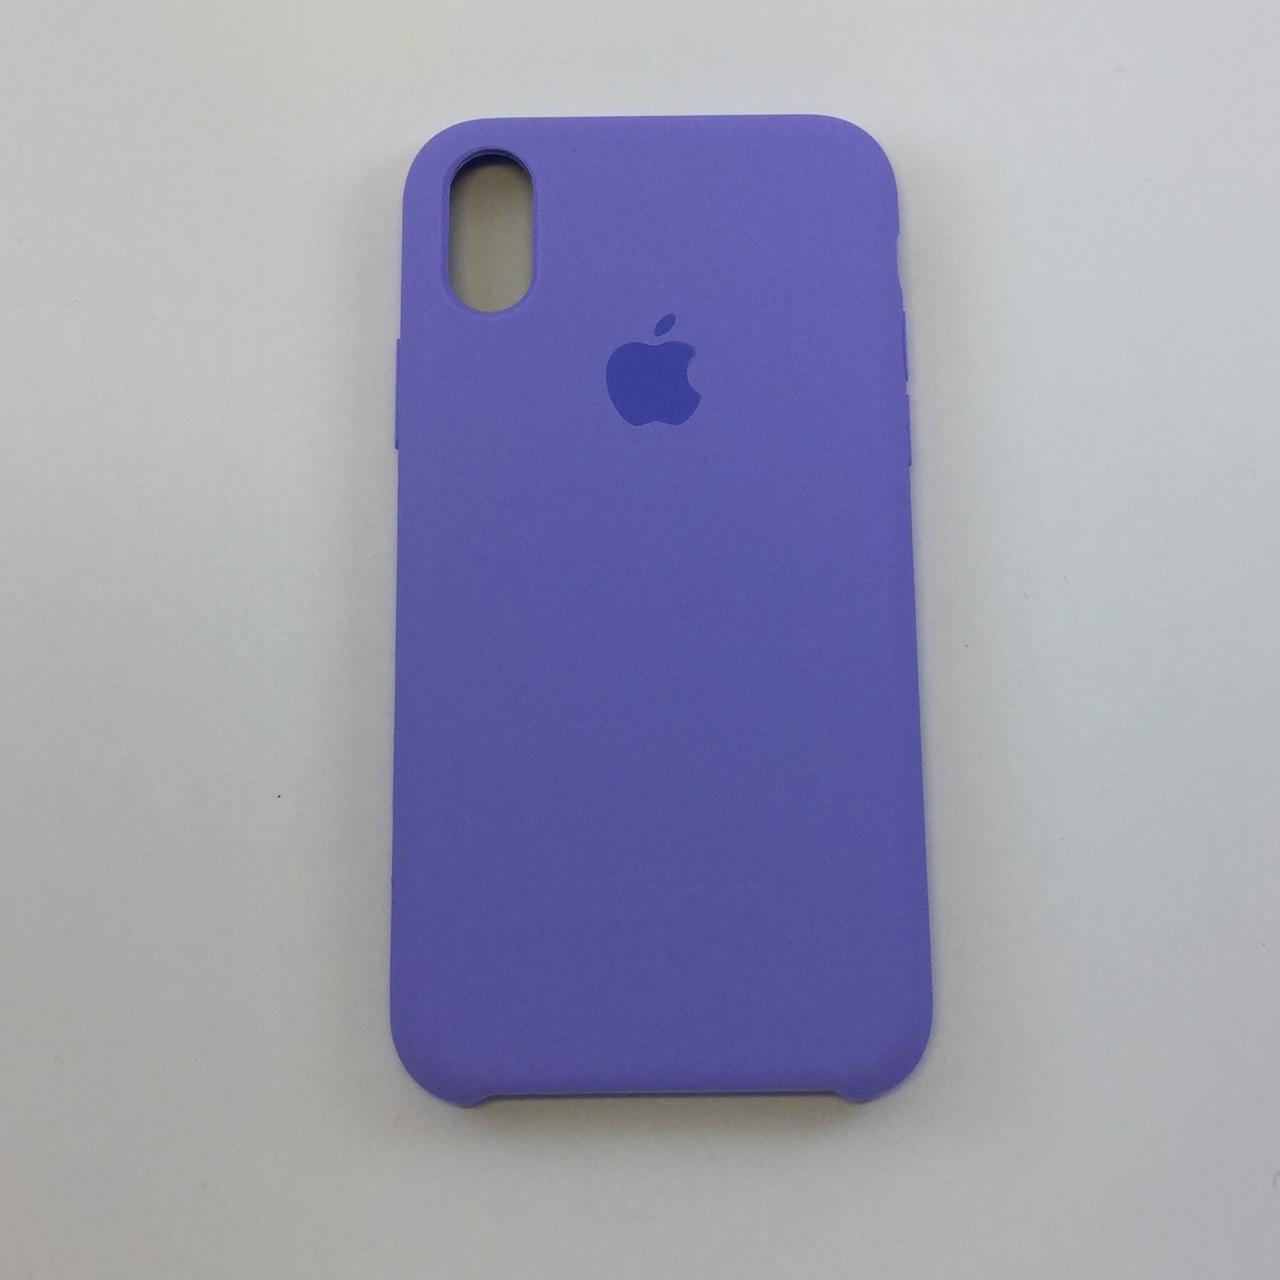 "Чехол - Silicon Case для iPhone ""Сирень - №41"" - copy orig."